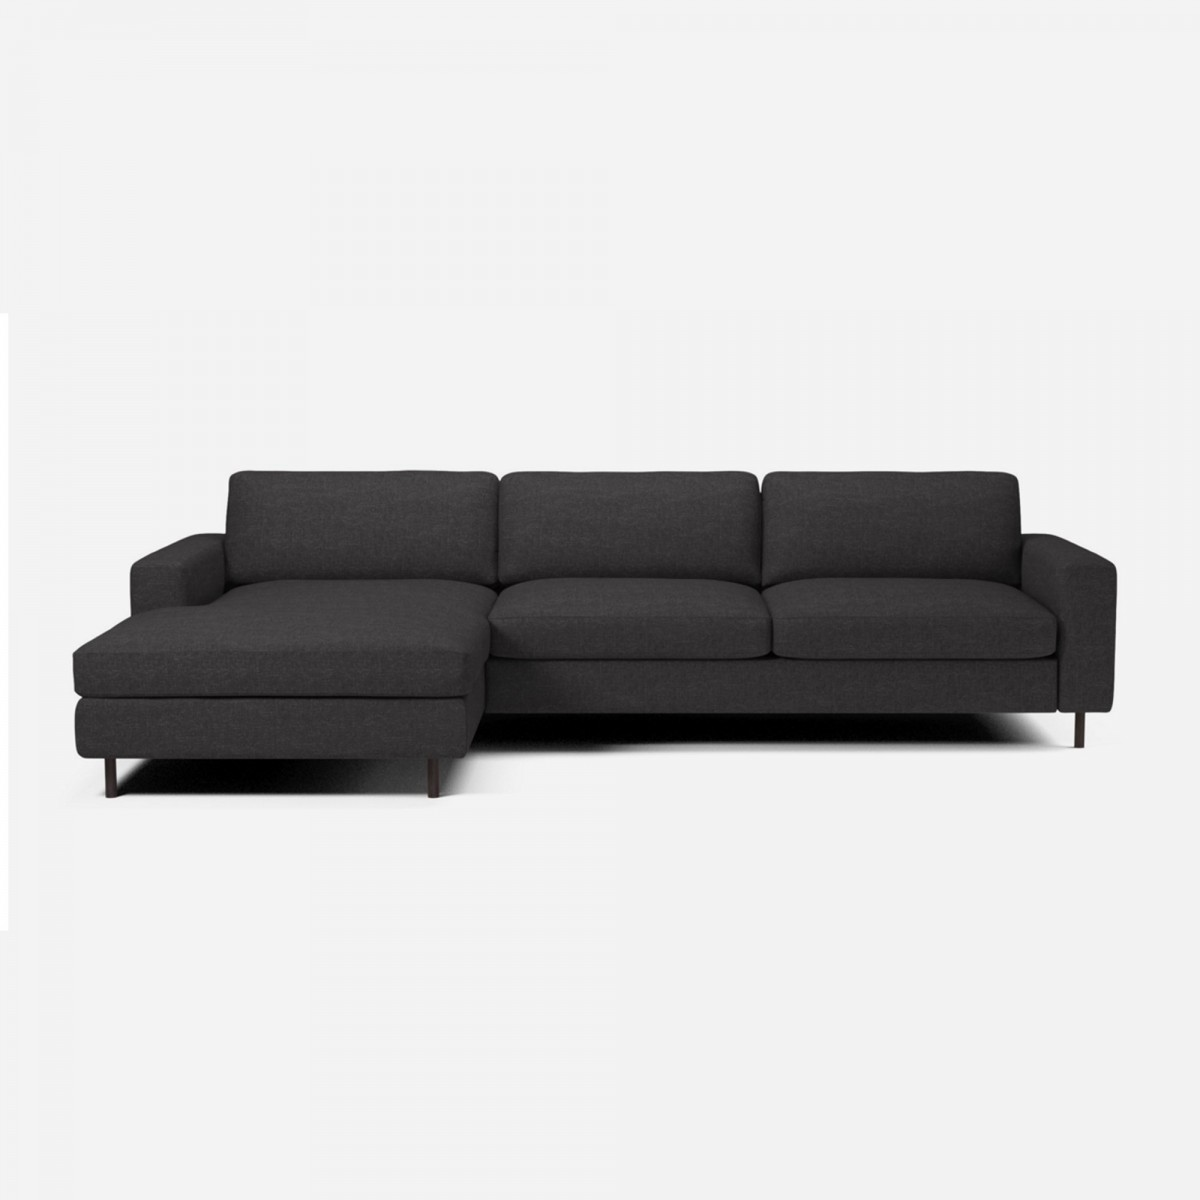 canap scandinavia 3 places 1 2 avec chaise longue bolia. Black Bedroom Furniture Sets. Home Design Ideas